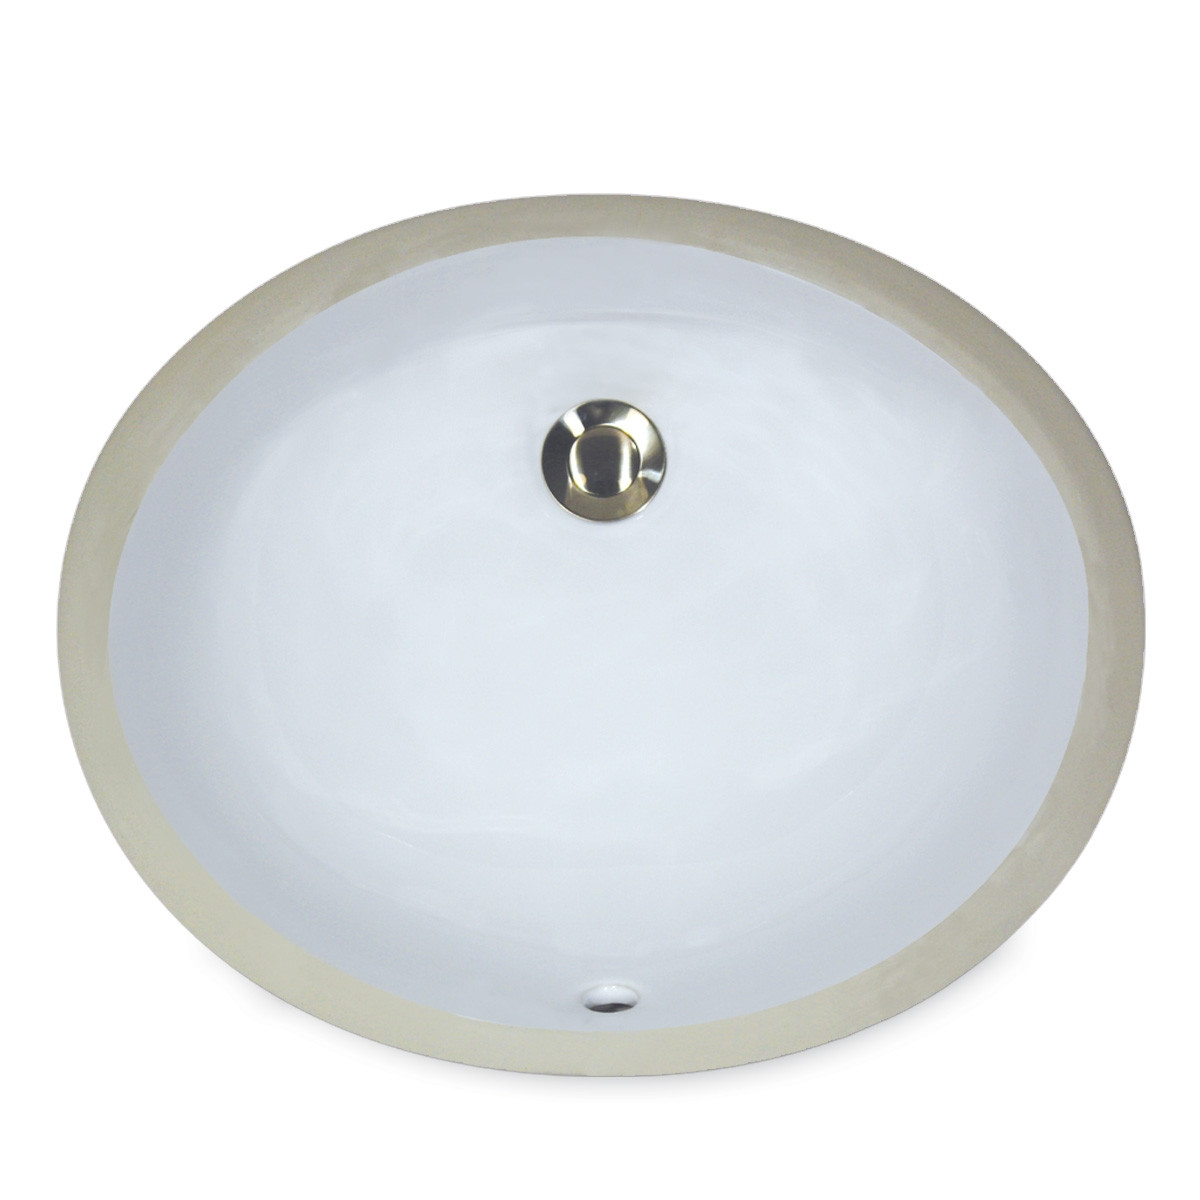 "Nantucket UM-17x14-K White 19 1/2"" Oval Ceramic Undermount Bathroom Porcelain Sink"